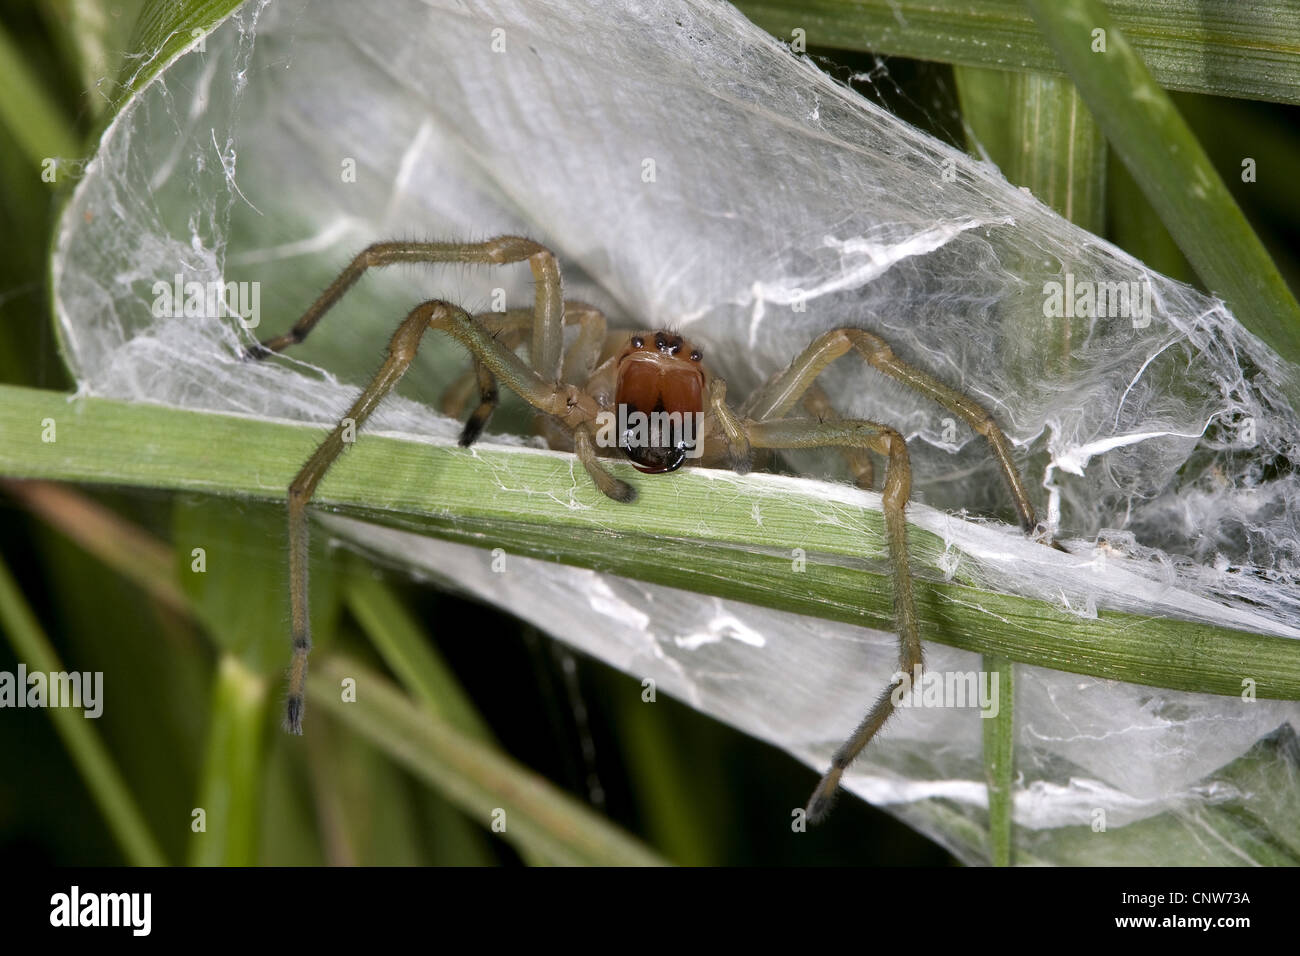 European sac spider, yellow sack spider (Cheiracanthium punctorium), at its nest, web sac, Germany - Stock Image